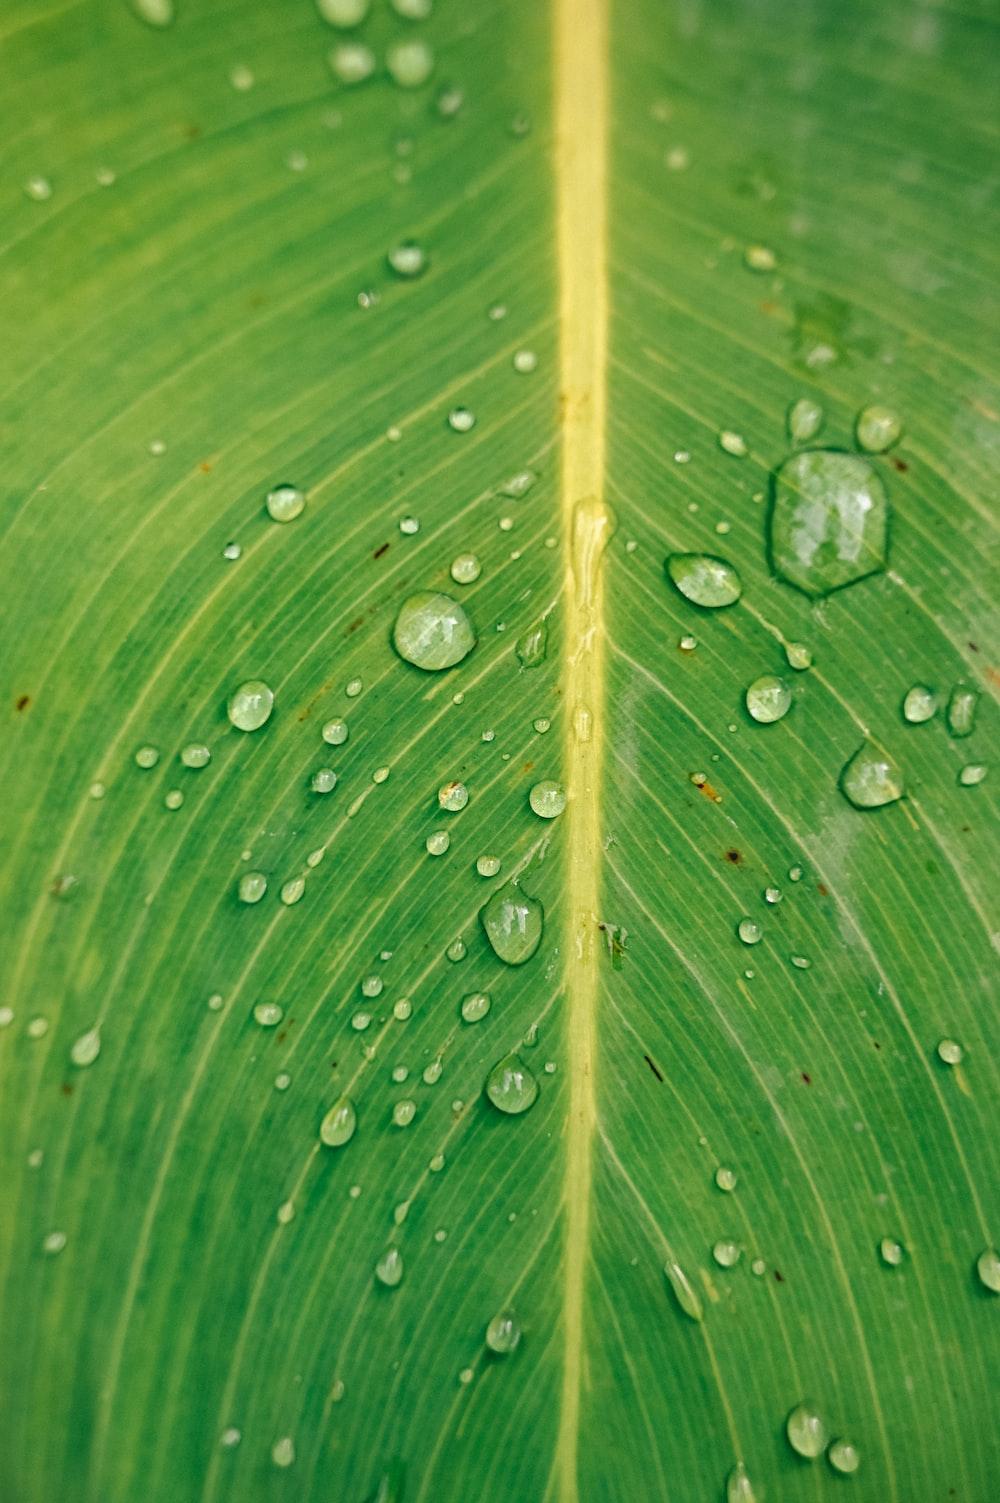 dewdrop on green leafed plant